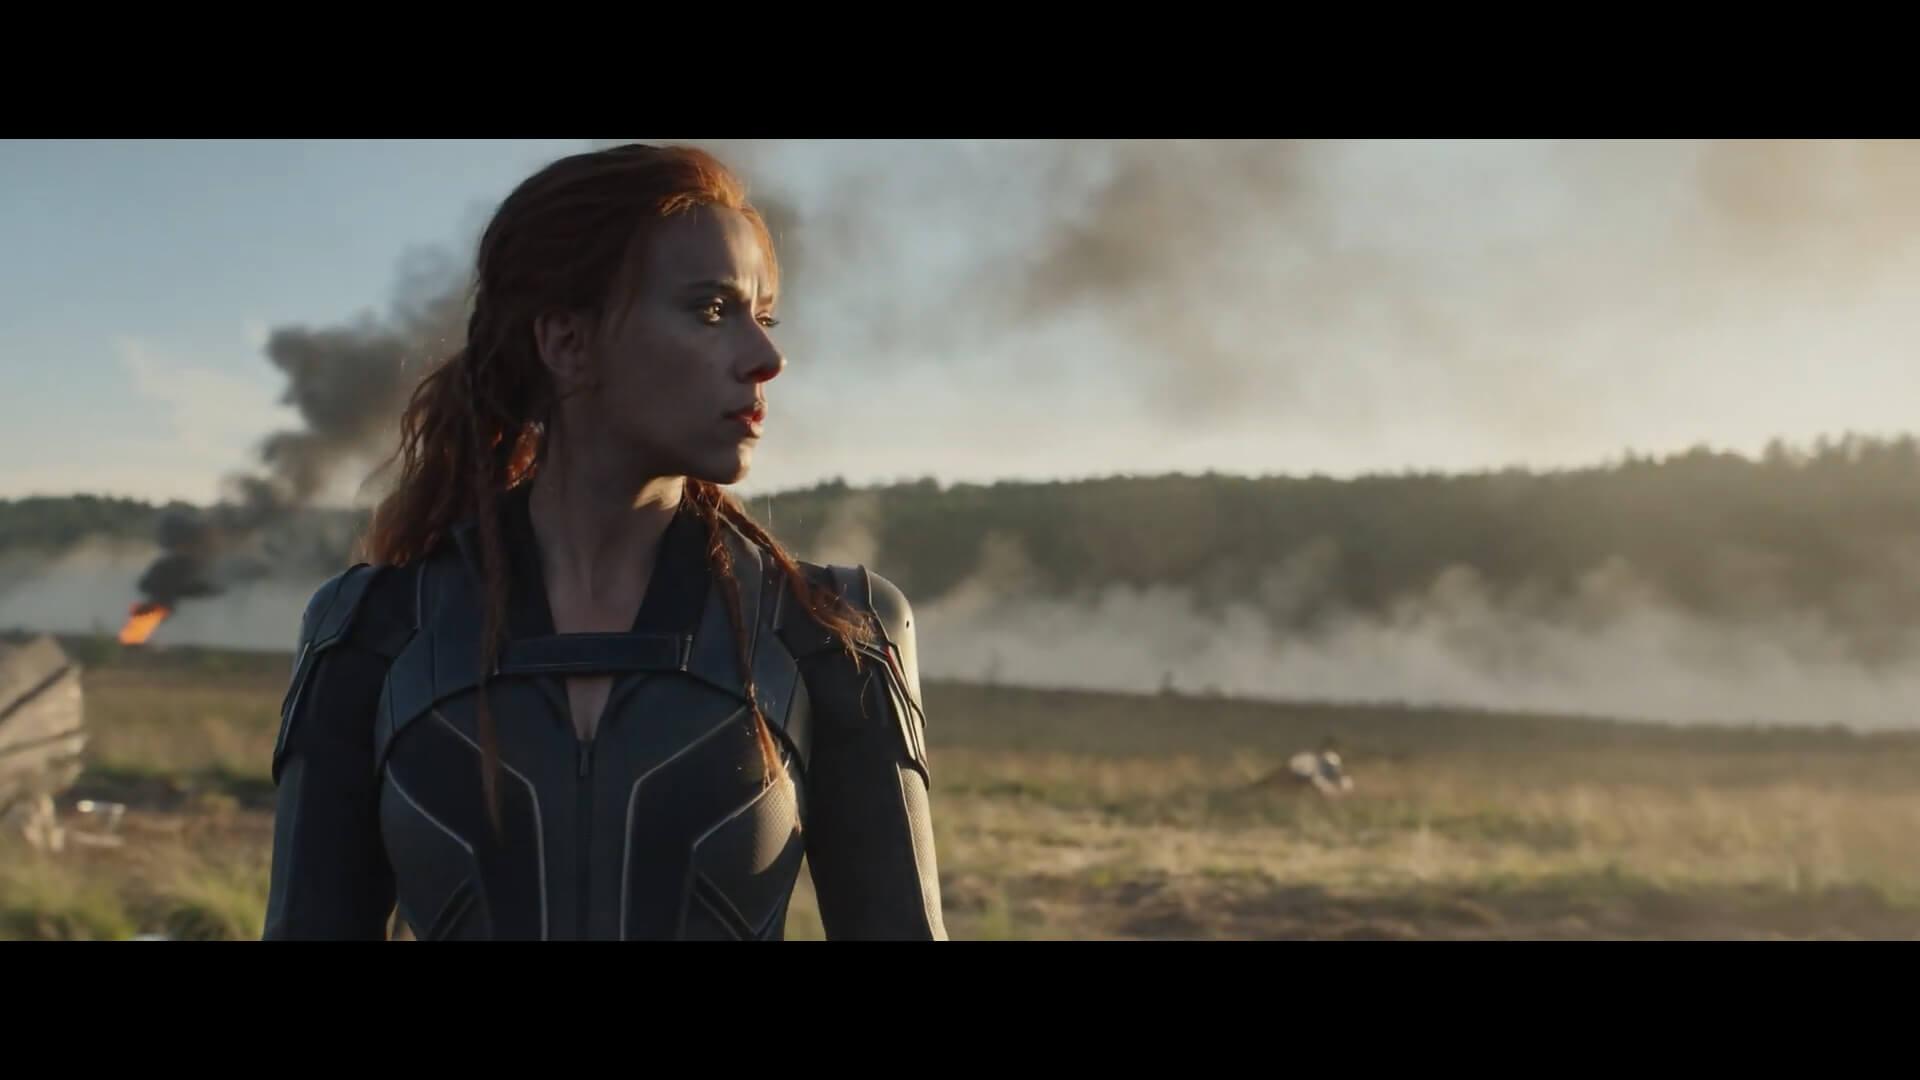 'Black Widow' de Marvel el oscuro origen de Natasha Romanoff